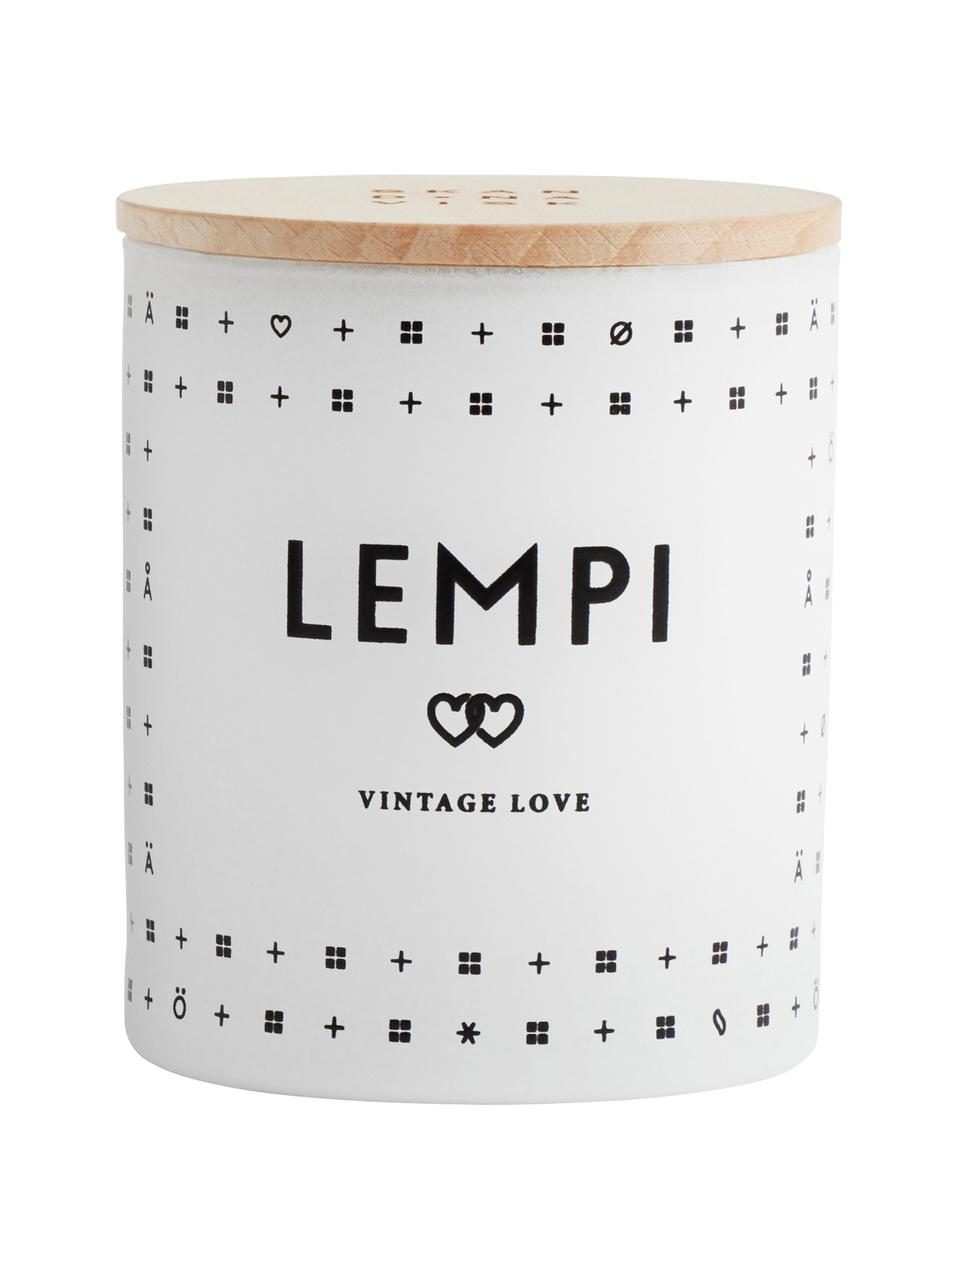 Duftkerze Lempi (Rose), Behälter: Glas, Deckel: Buchenholz, Weiß, Ø 8 x H 9 cm